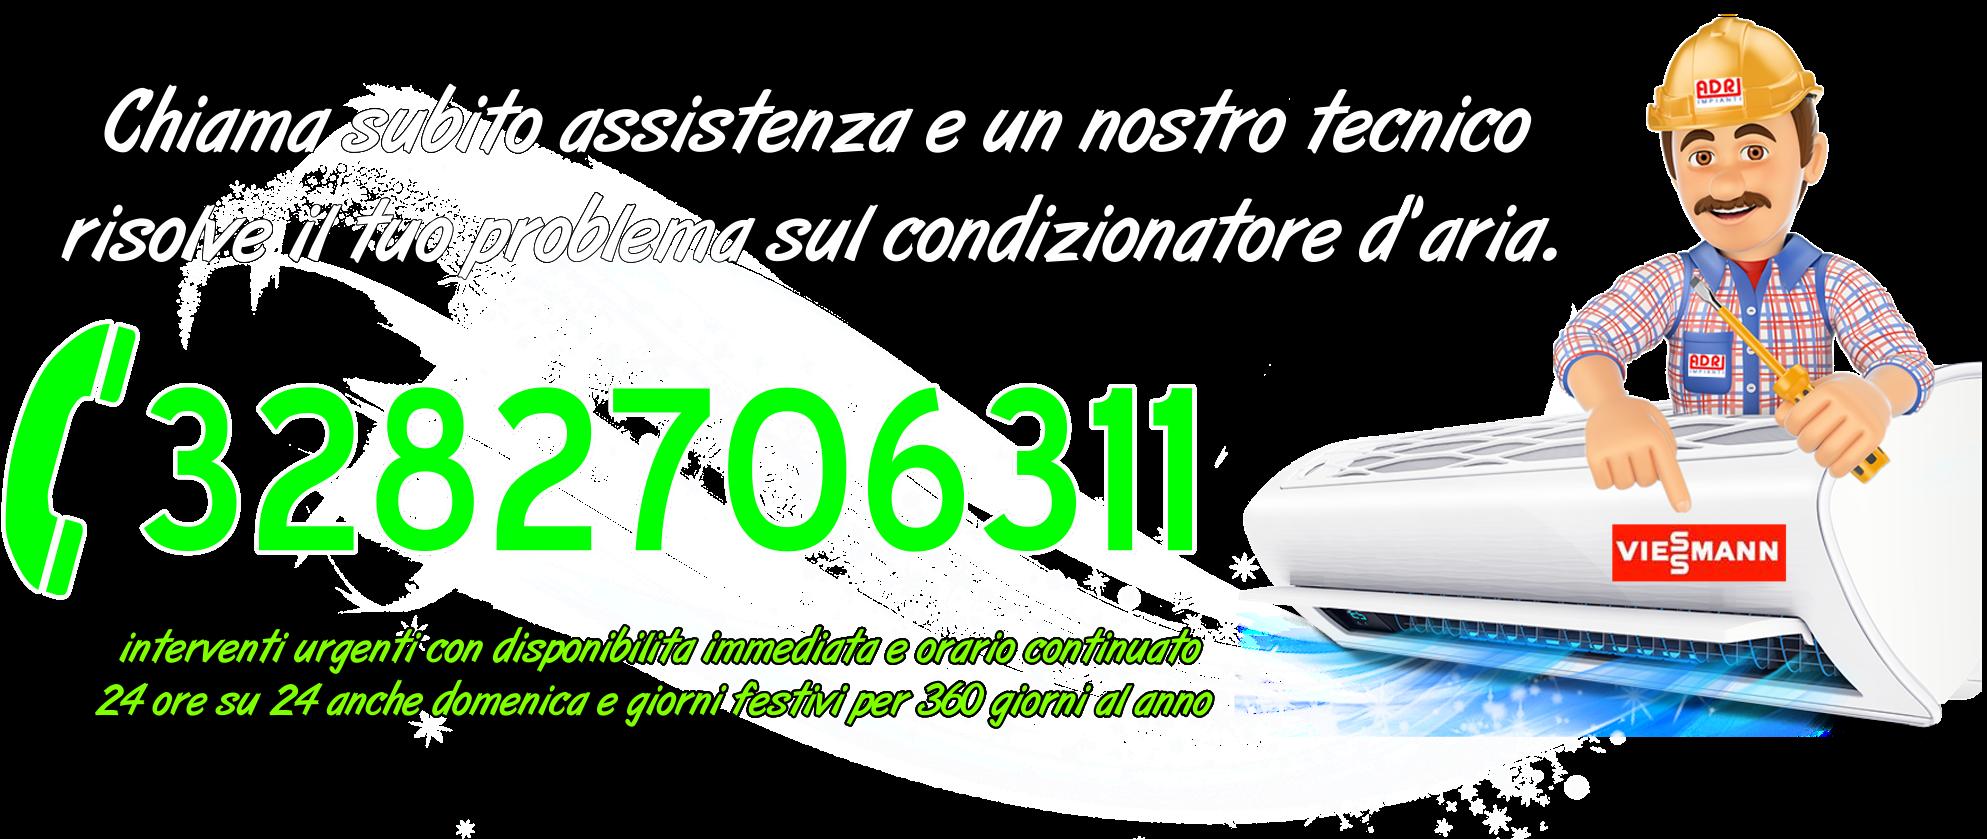 Assistenza condizionatori Viessmann San Mauro Torinese